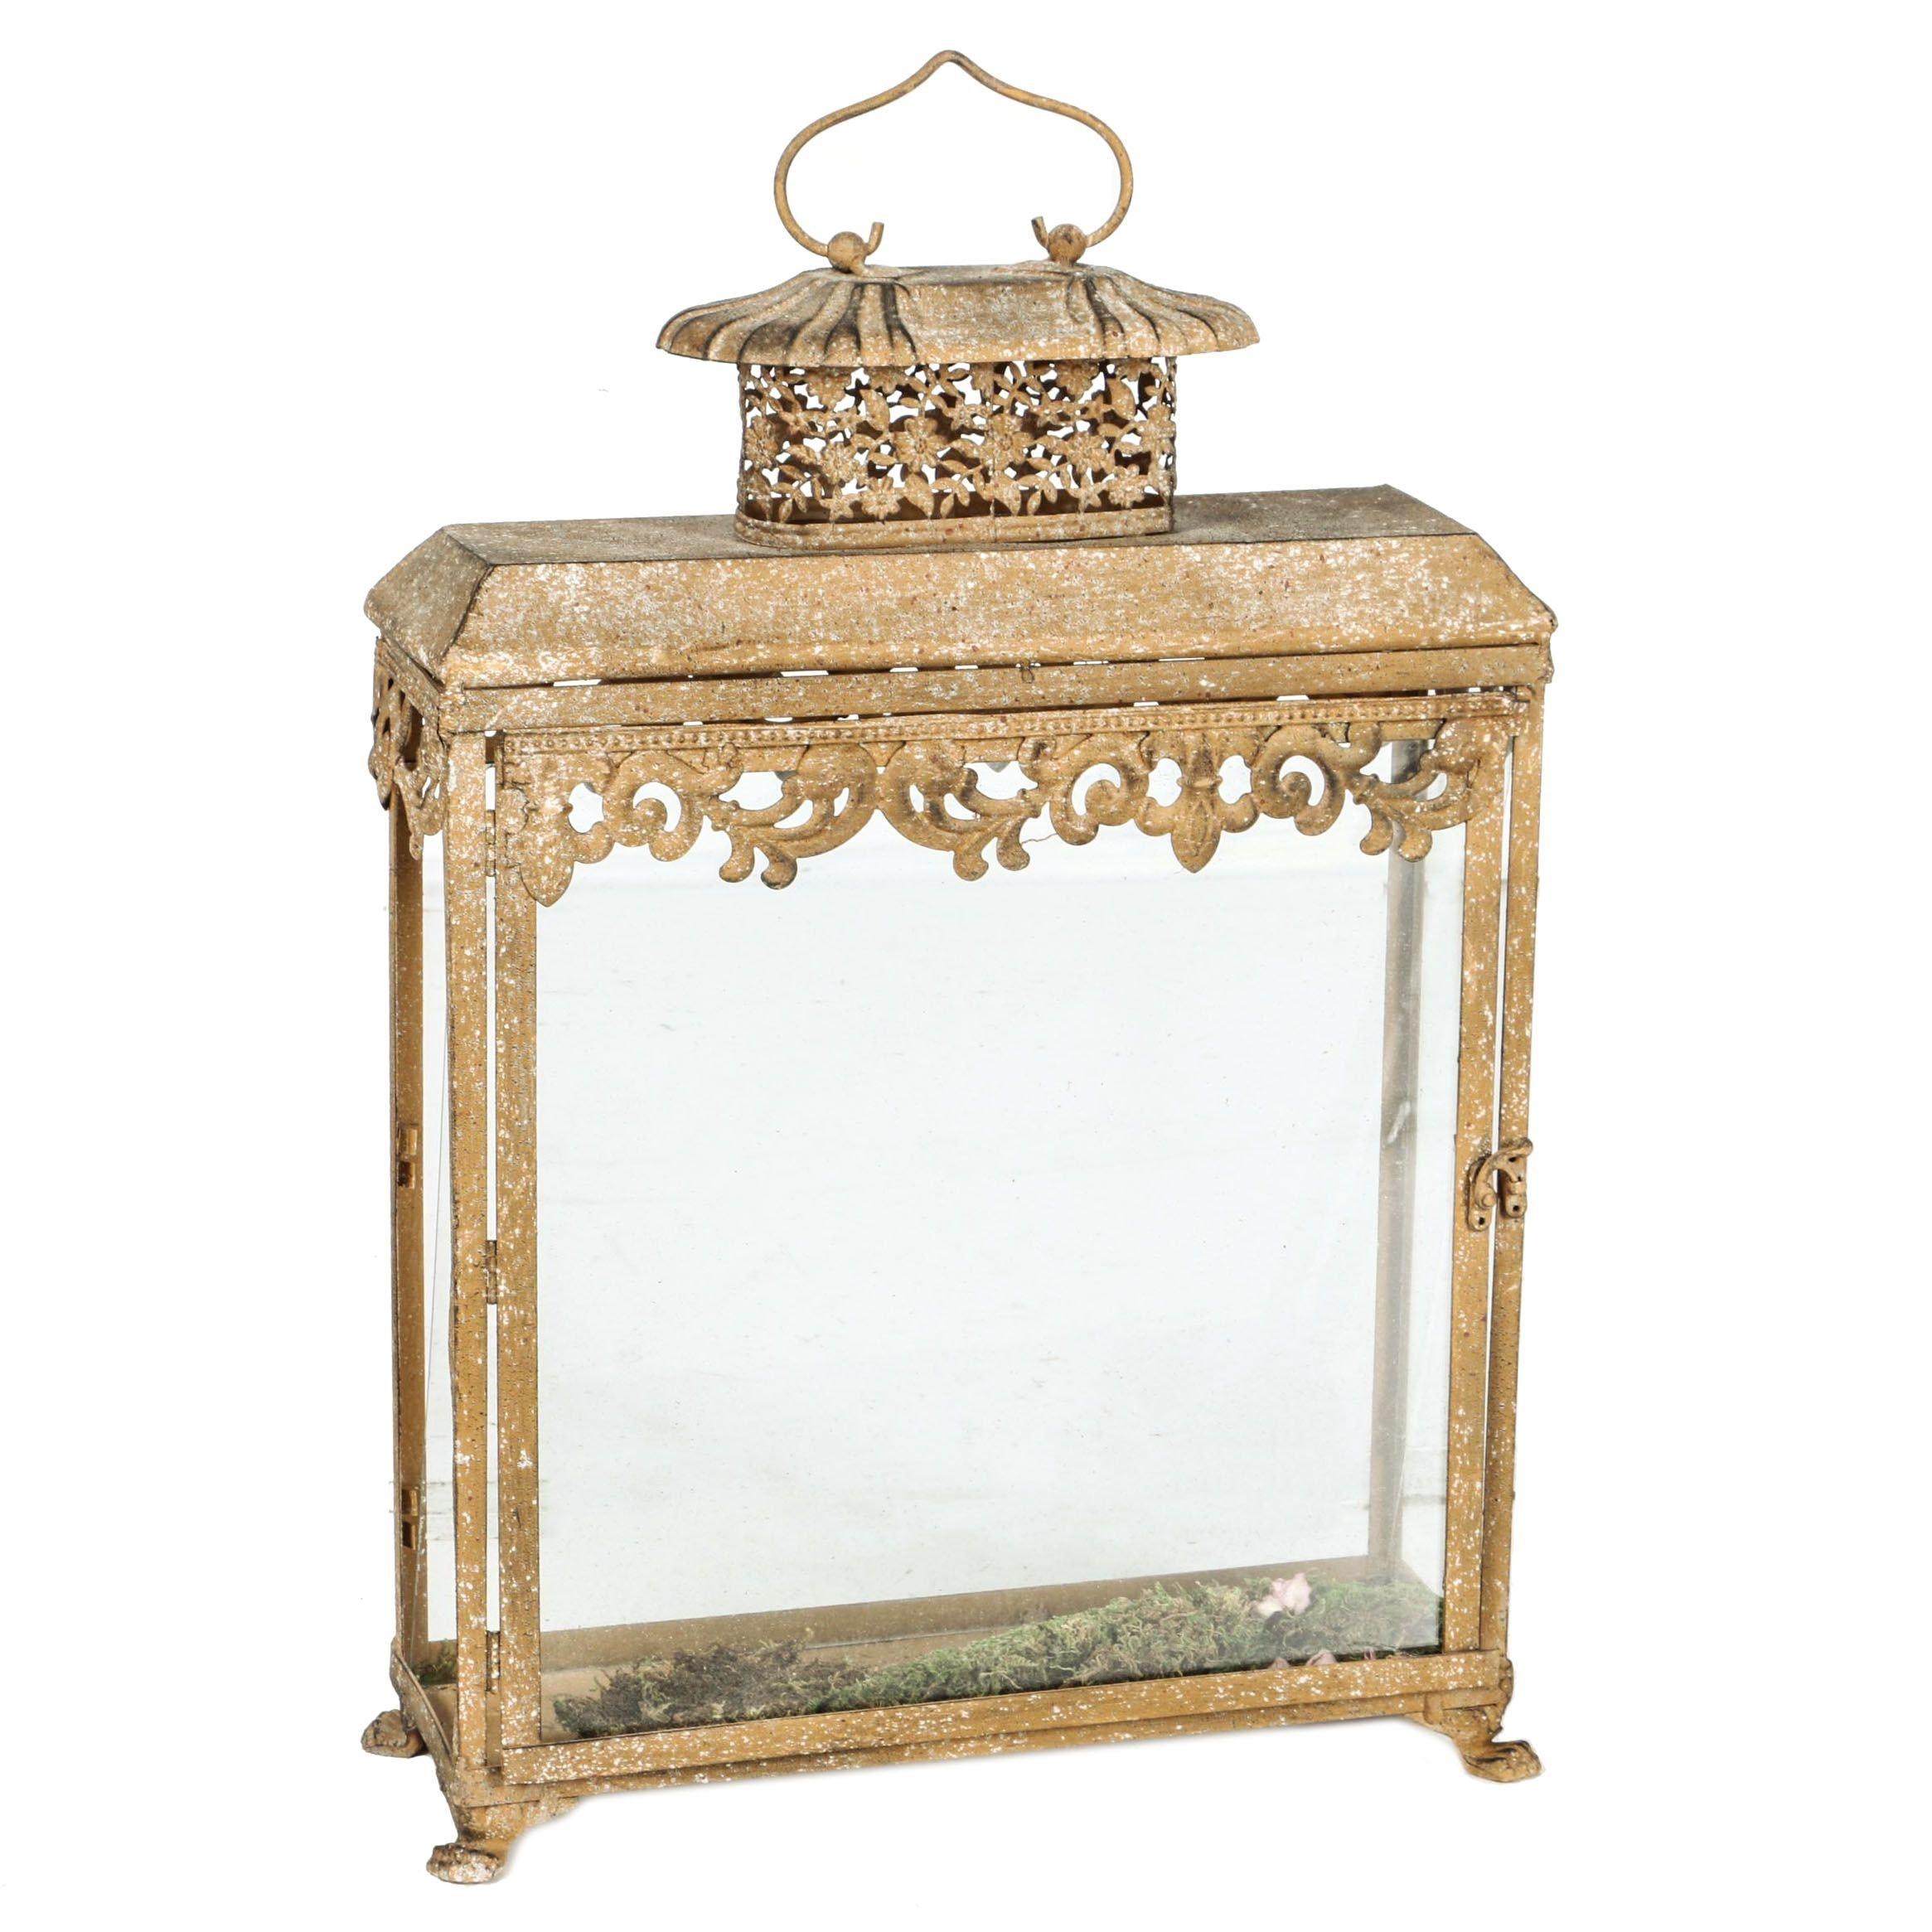 Glass and Metal Lantern Style Display Box